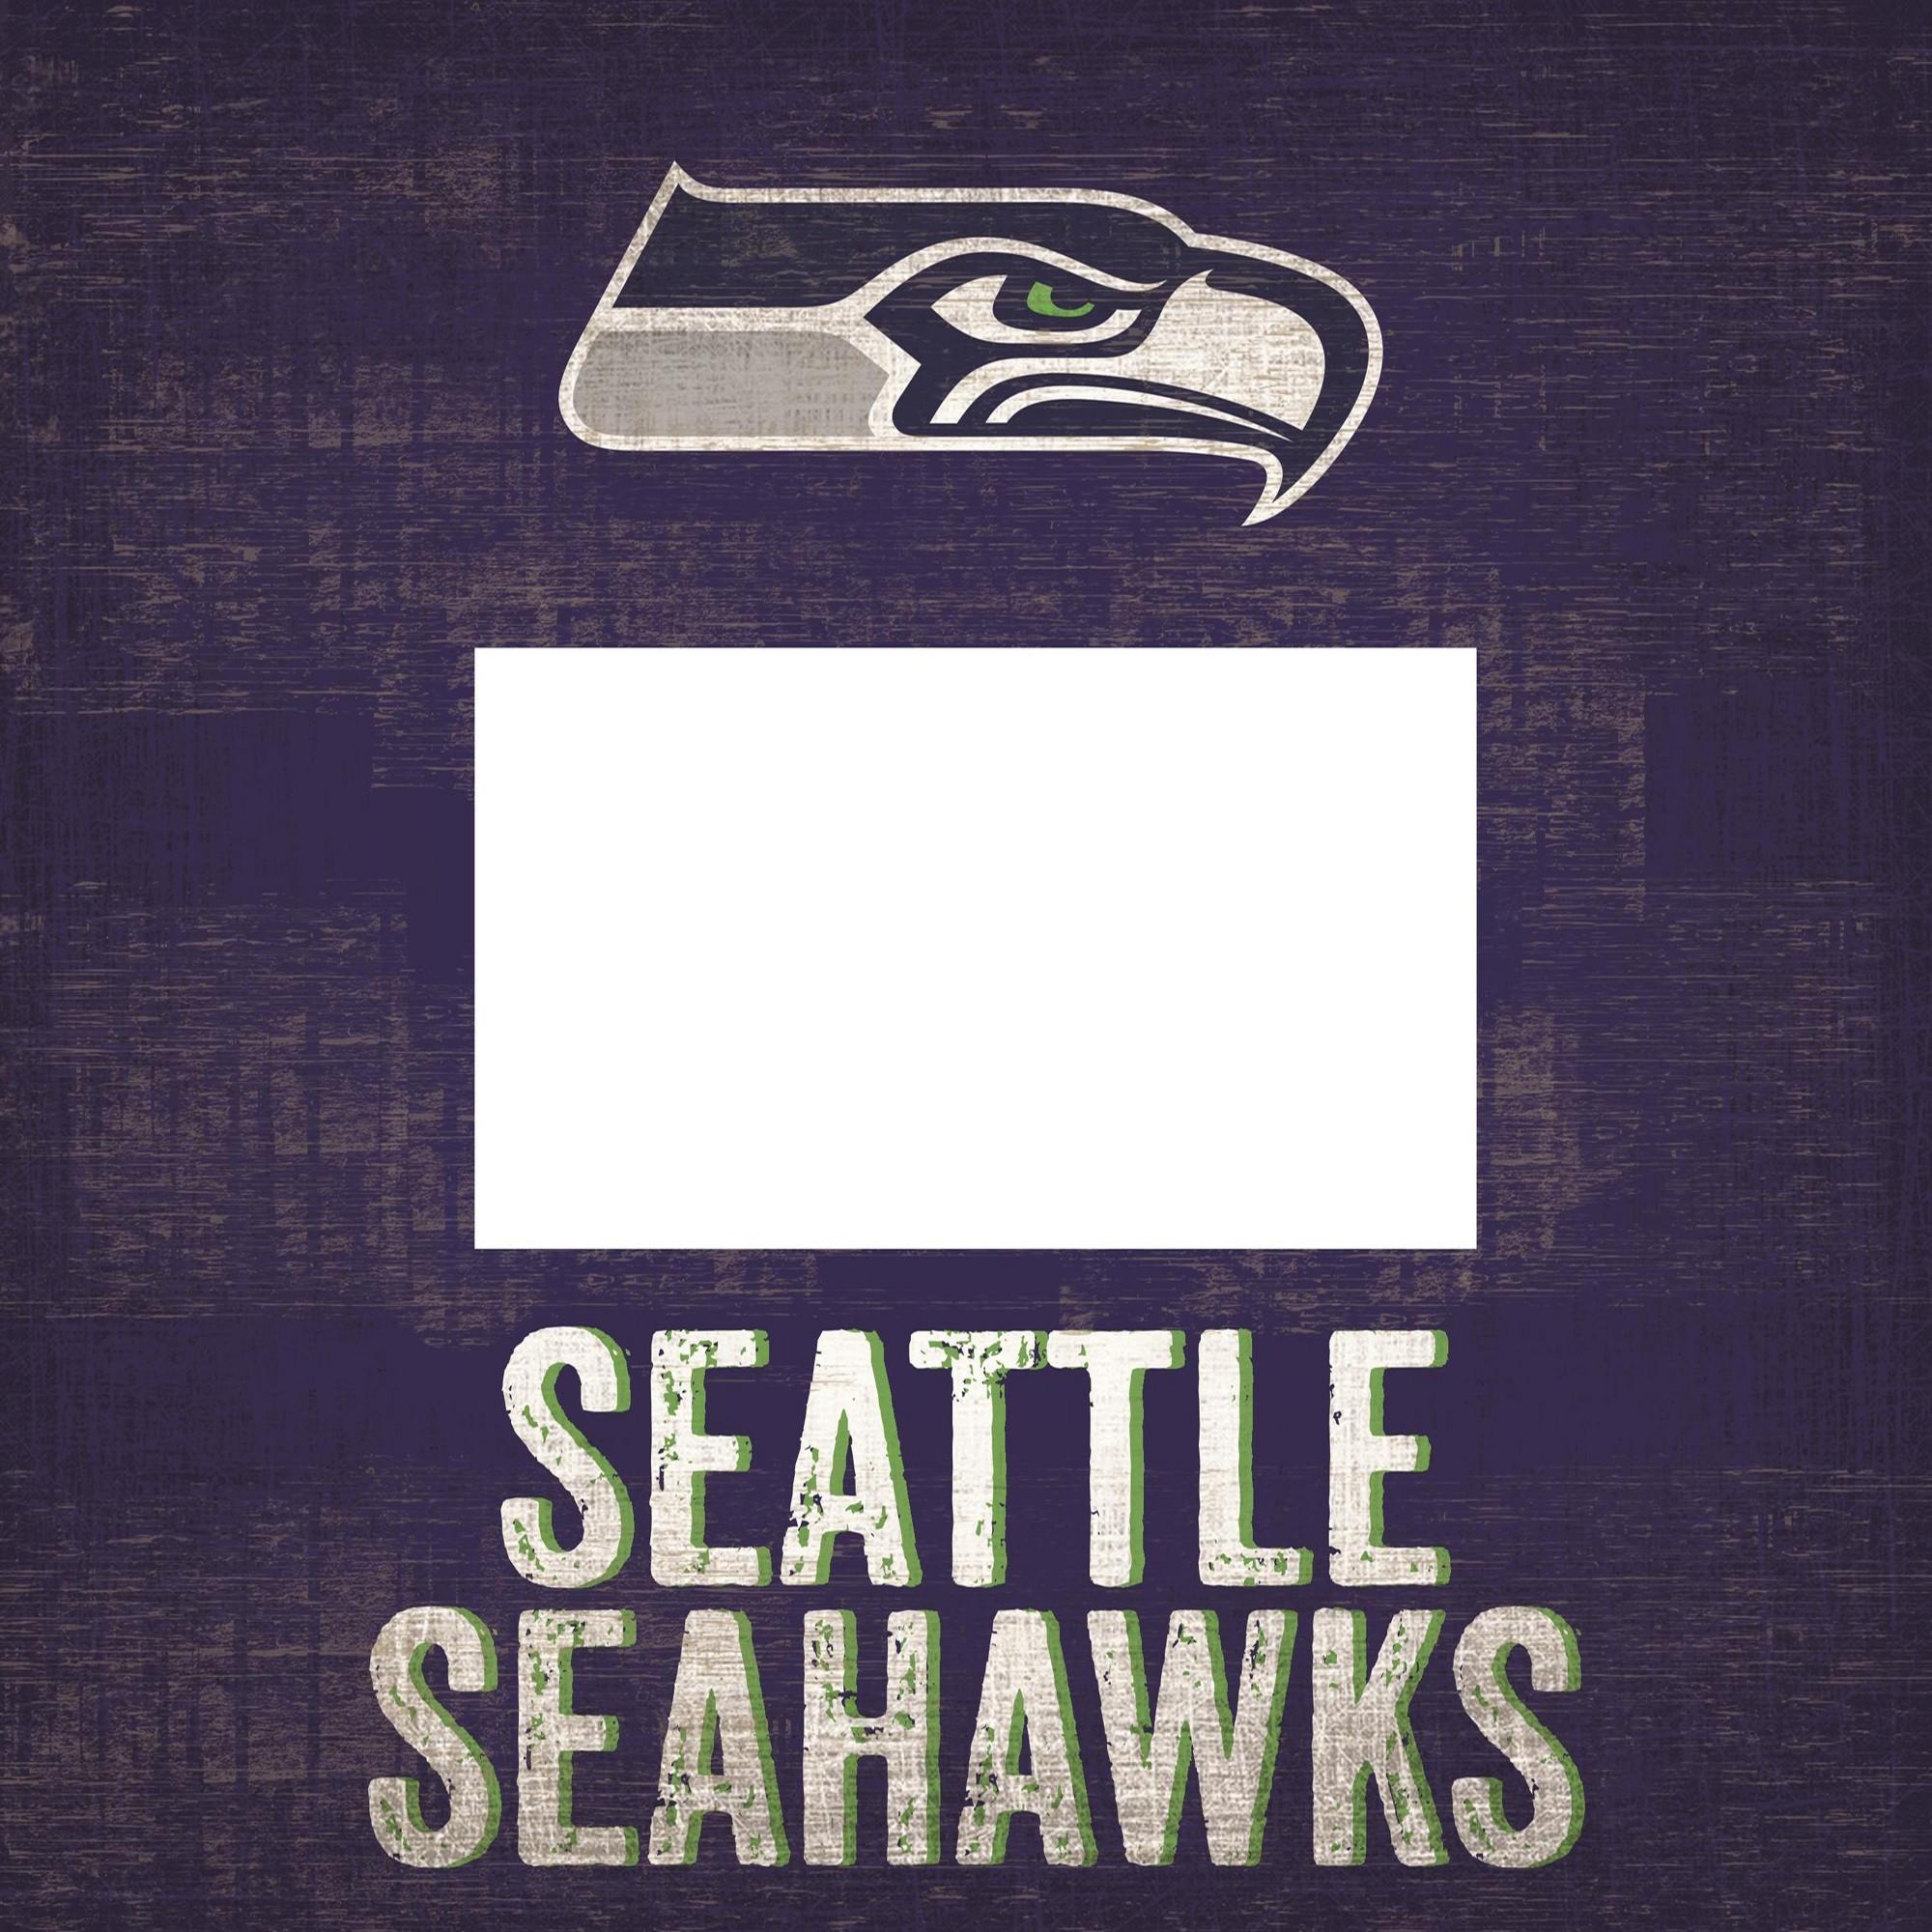 Nfl seattle seahawks fan creations 10x10 picture frame sign nfl seattle seahawks fan creations 10x10 picture frame sign jeuxipadfo Choice Image